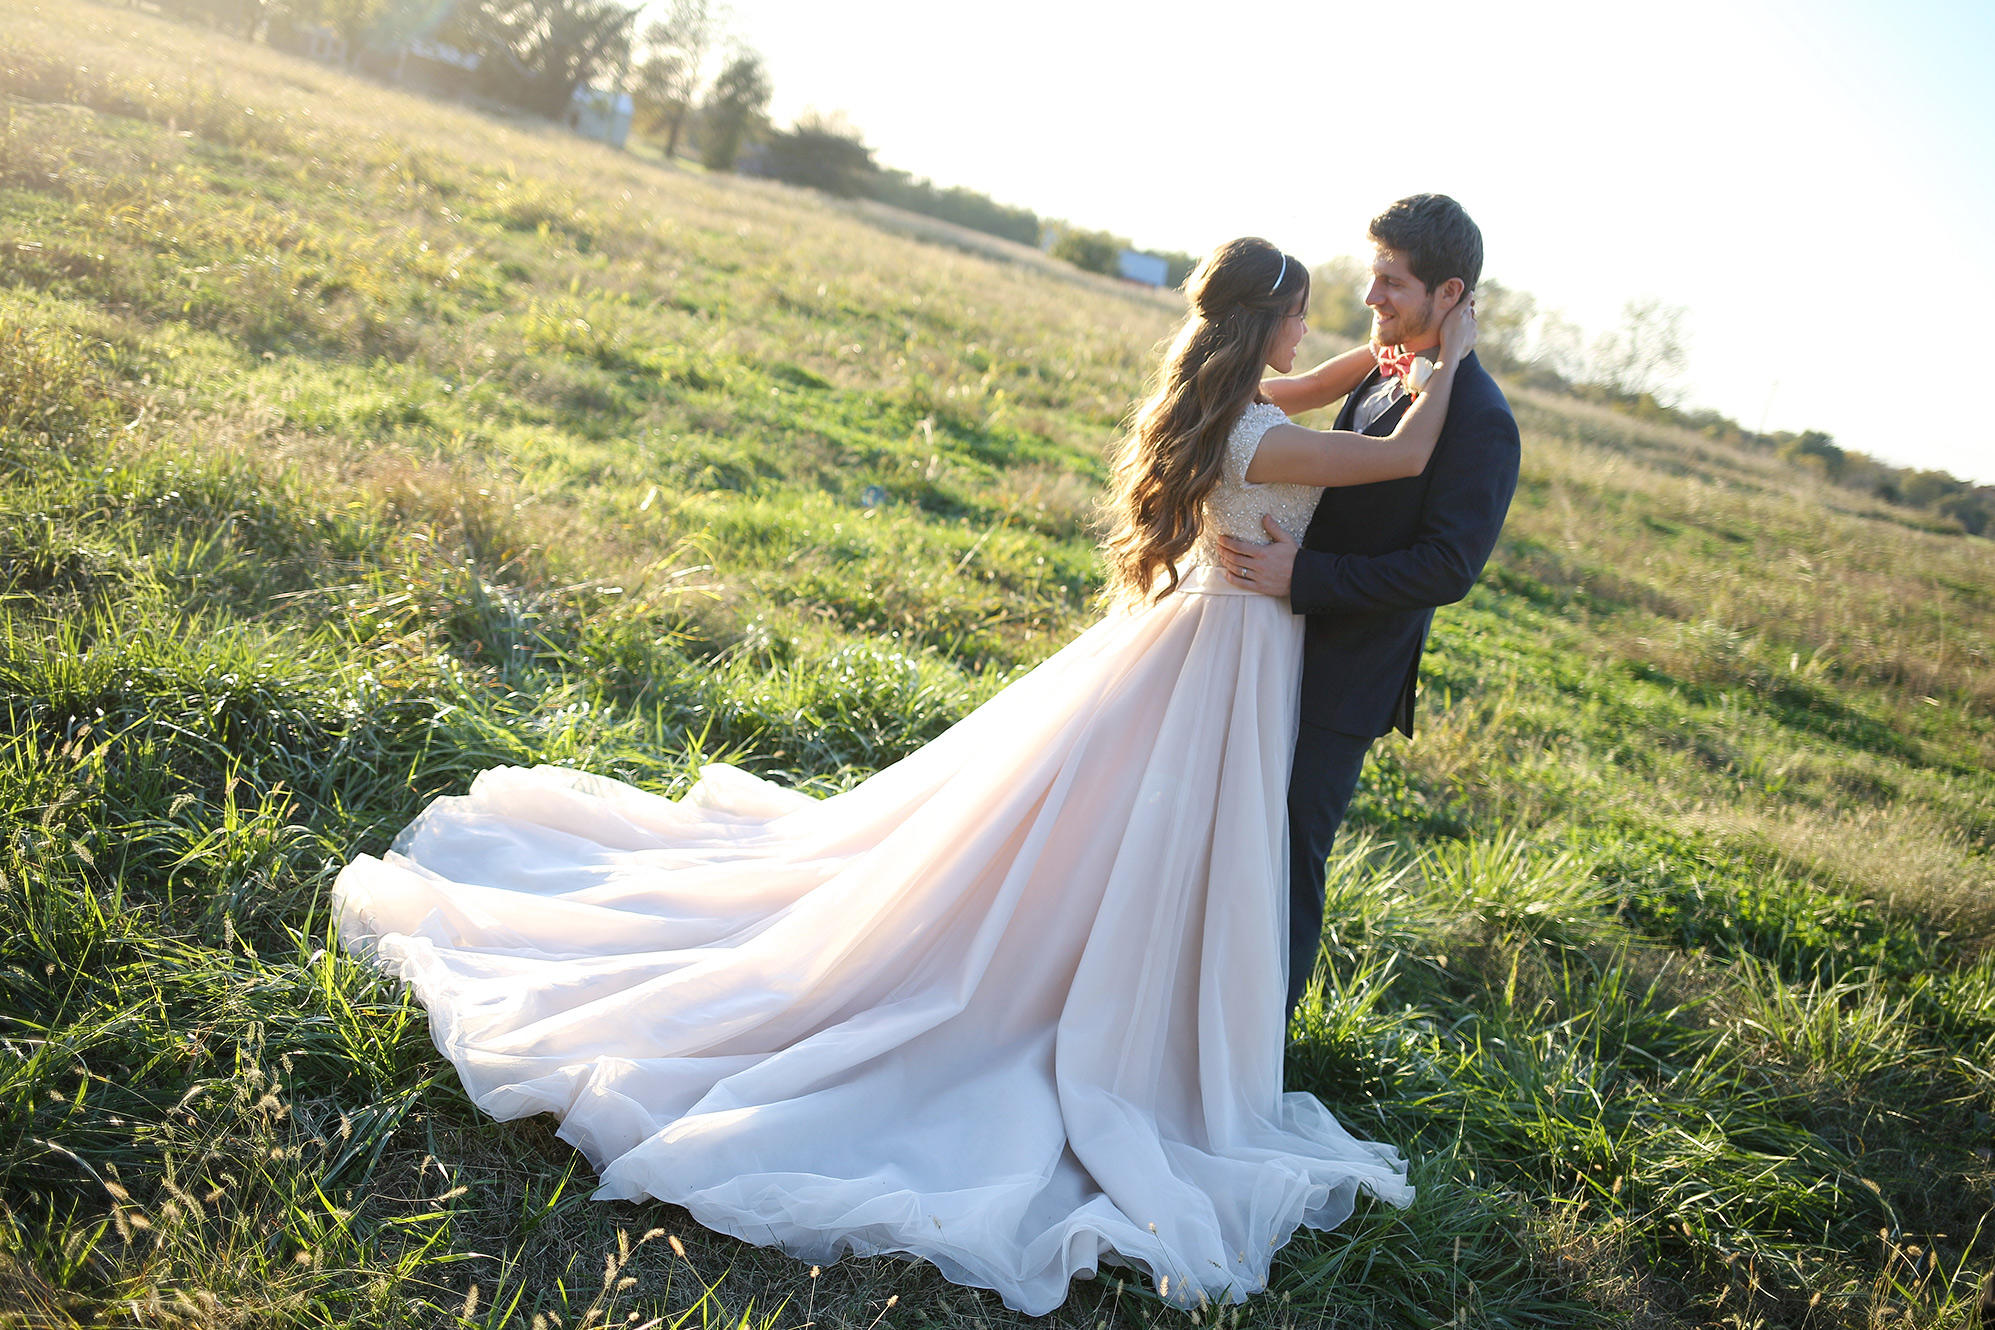 Jessa duggar and ben seewalds romantic wedding photo gallery 19 19 kids jessa ben wedding 30 freerunsca Image collections